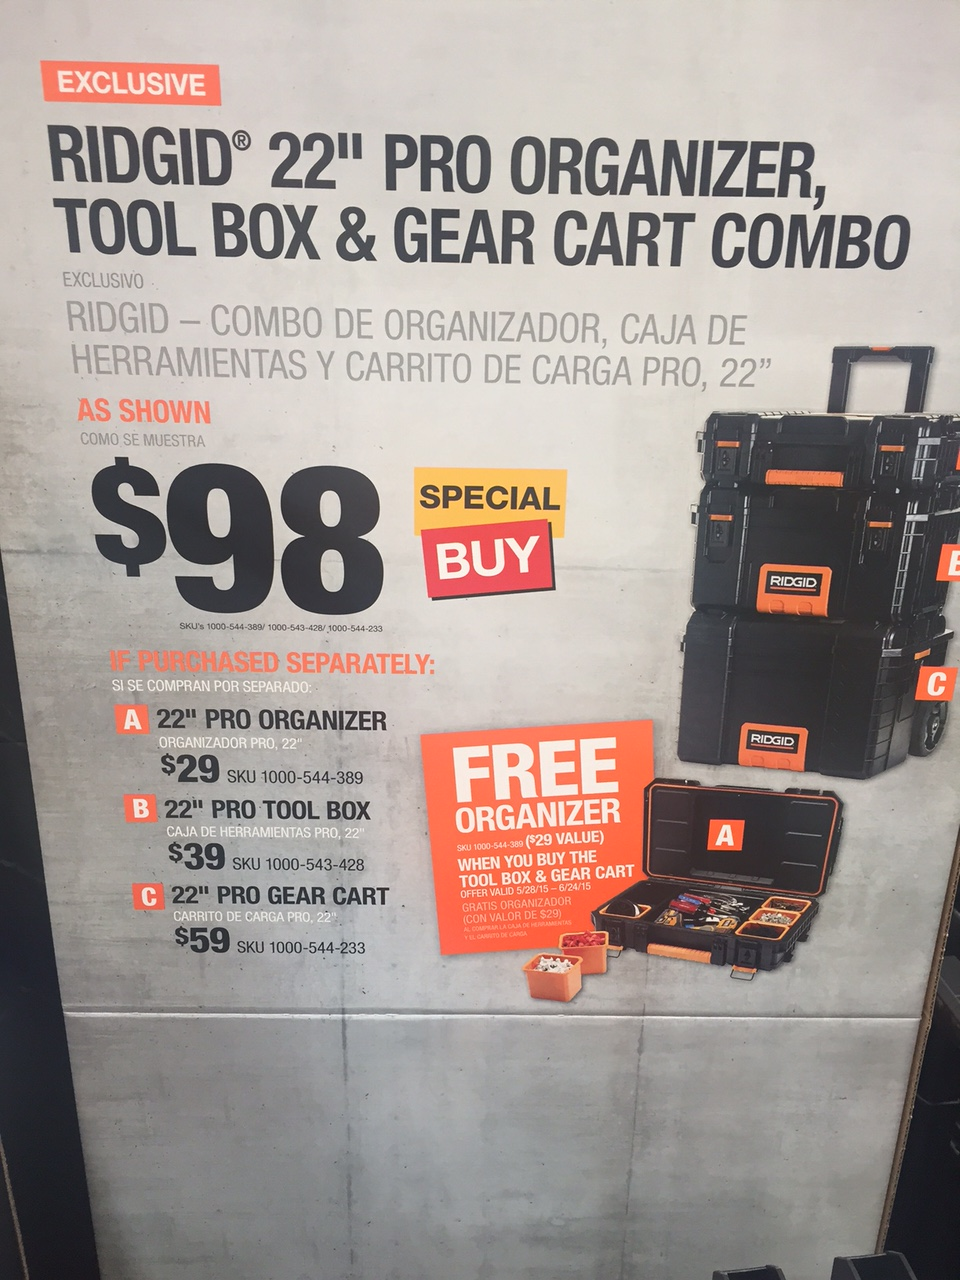 Ridgid toolbox sale-3448849.attach.jpg